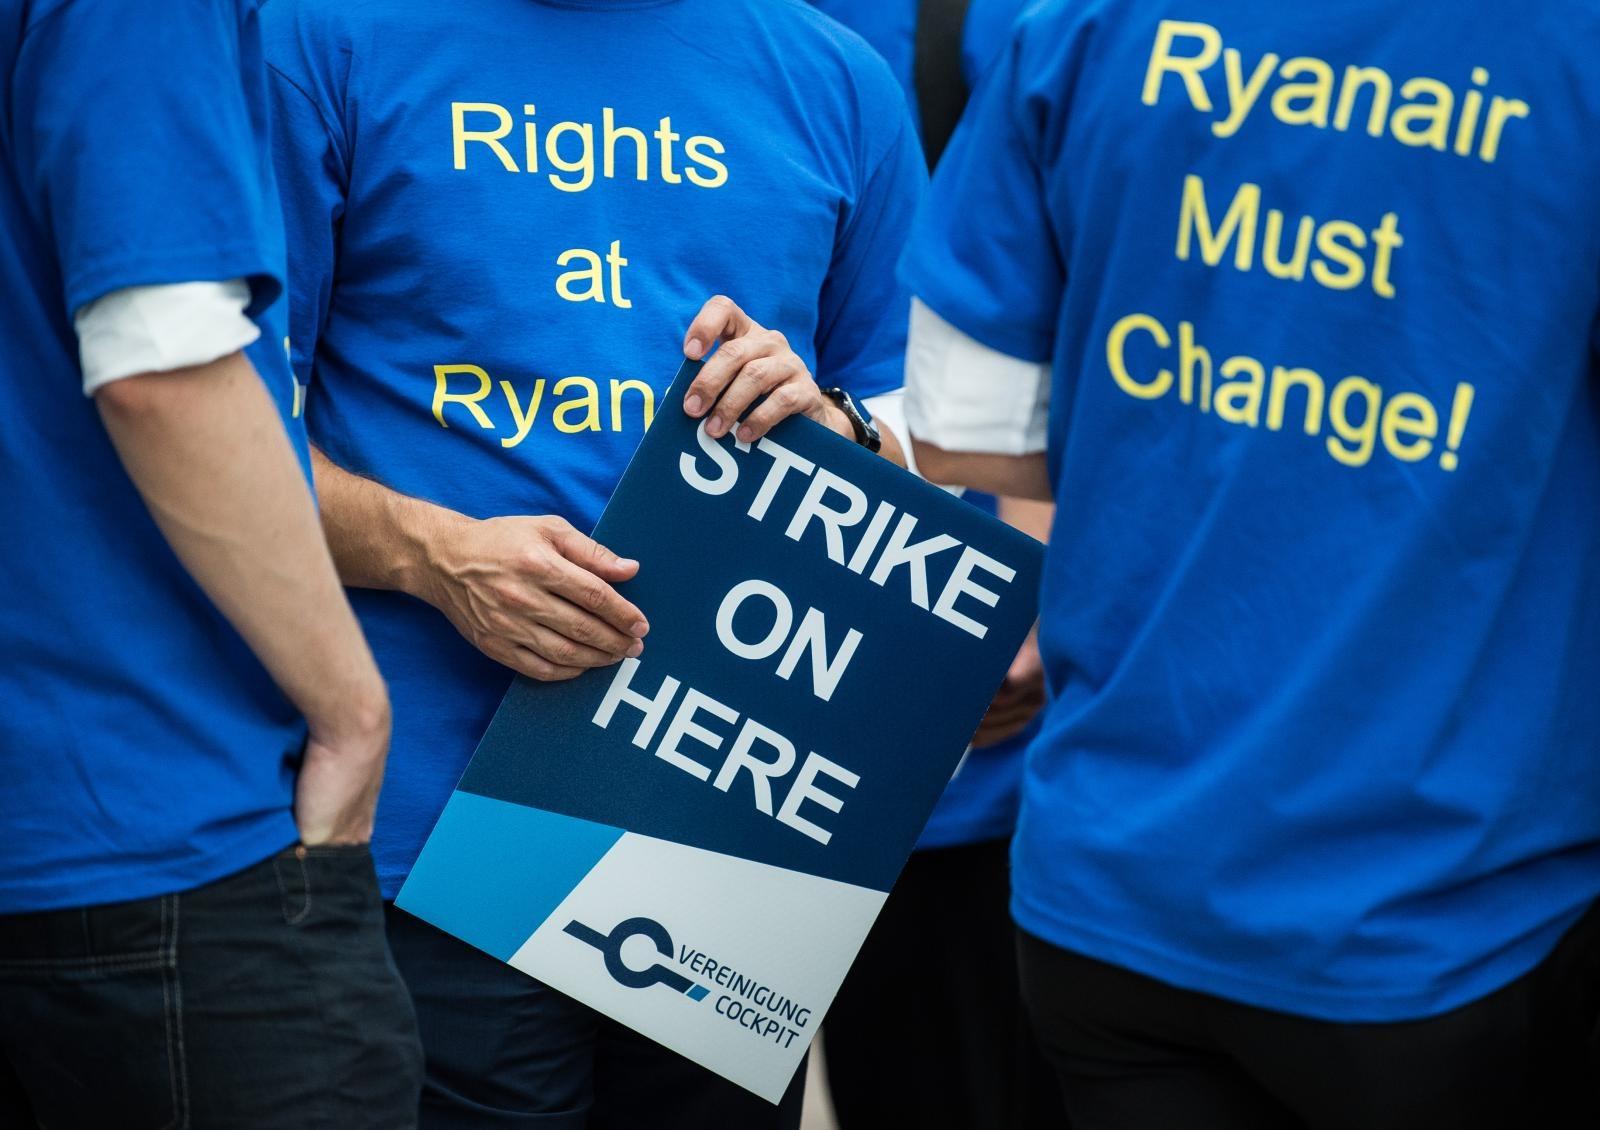 Stavka delavcev Ryanaira Vir:Pixell